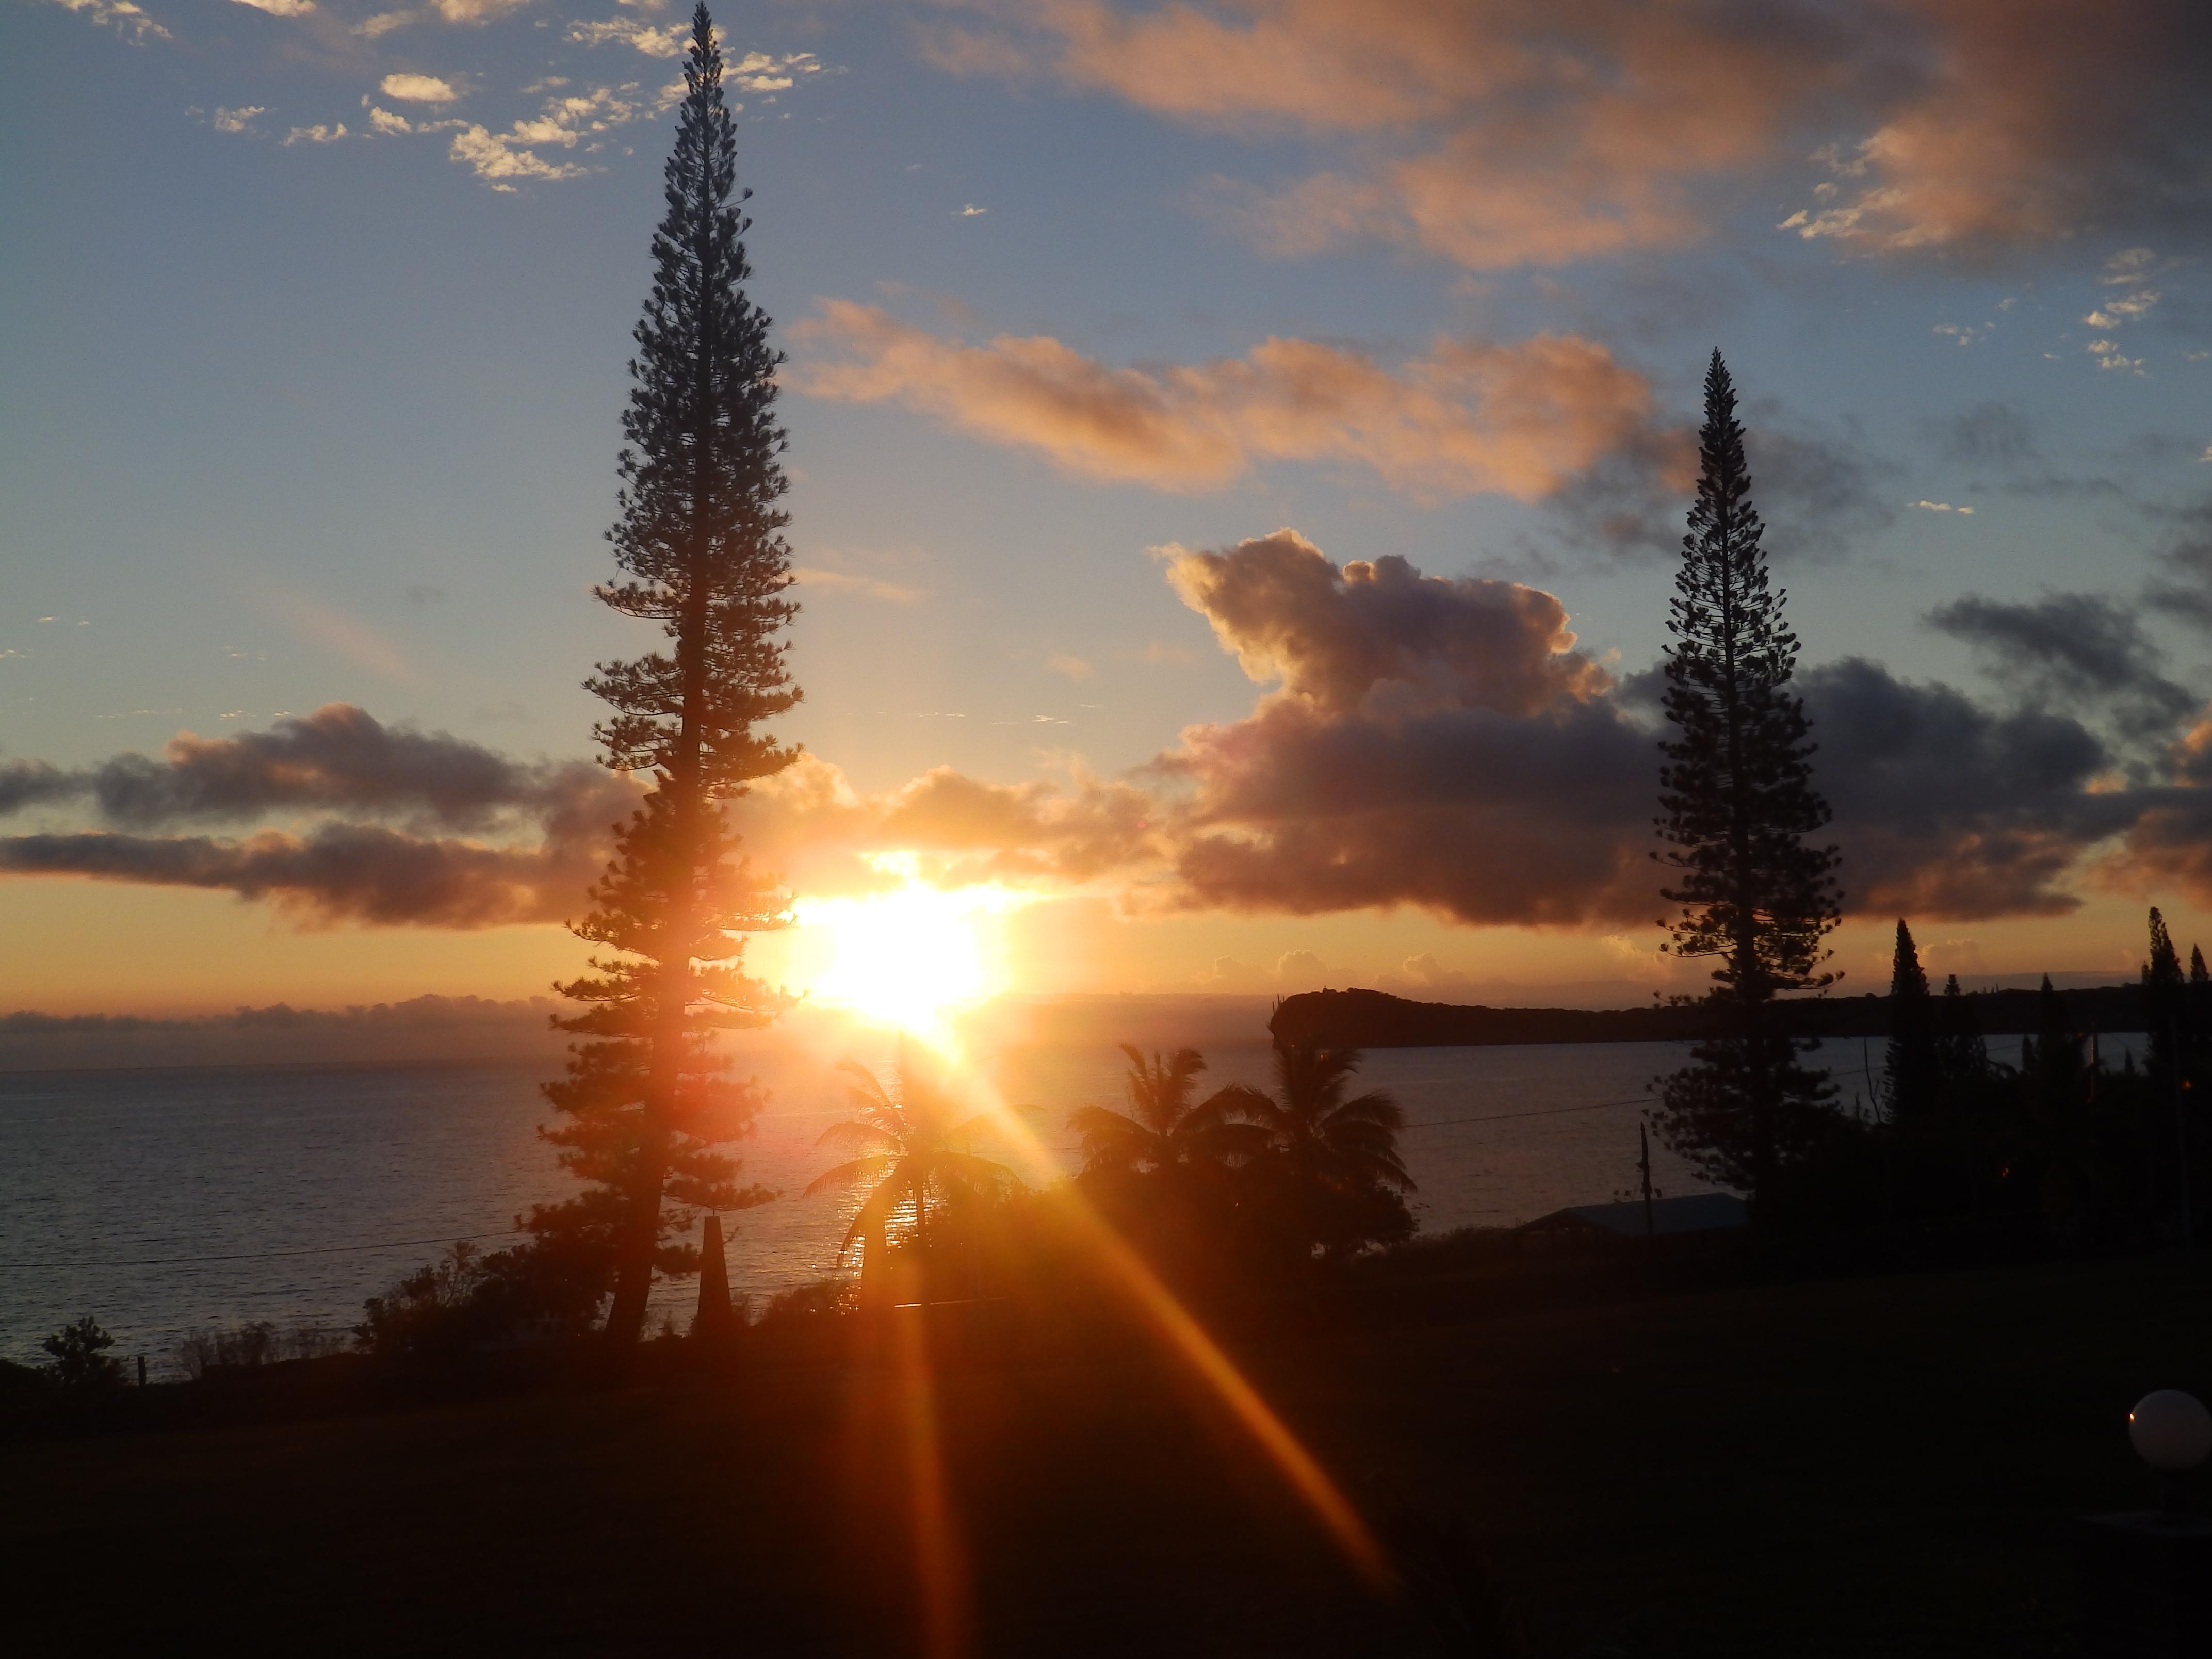 Coucher du soleil à Easo, vu de Béthanie